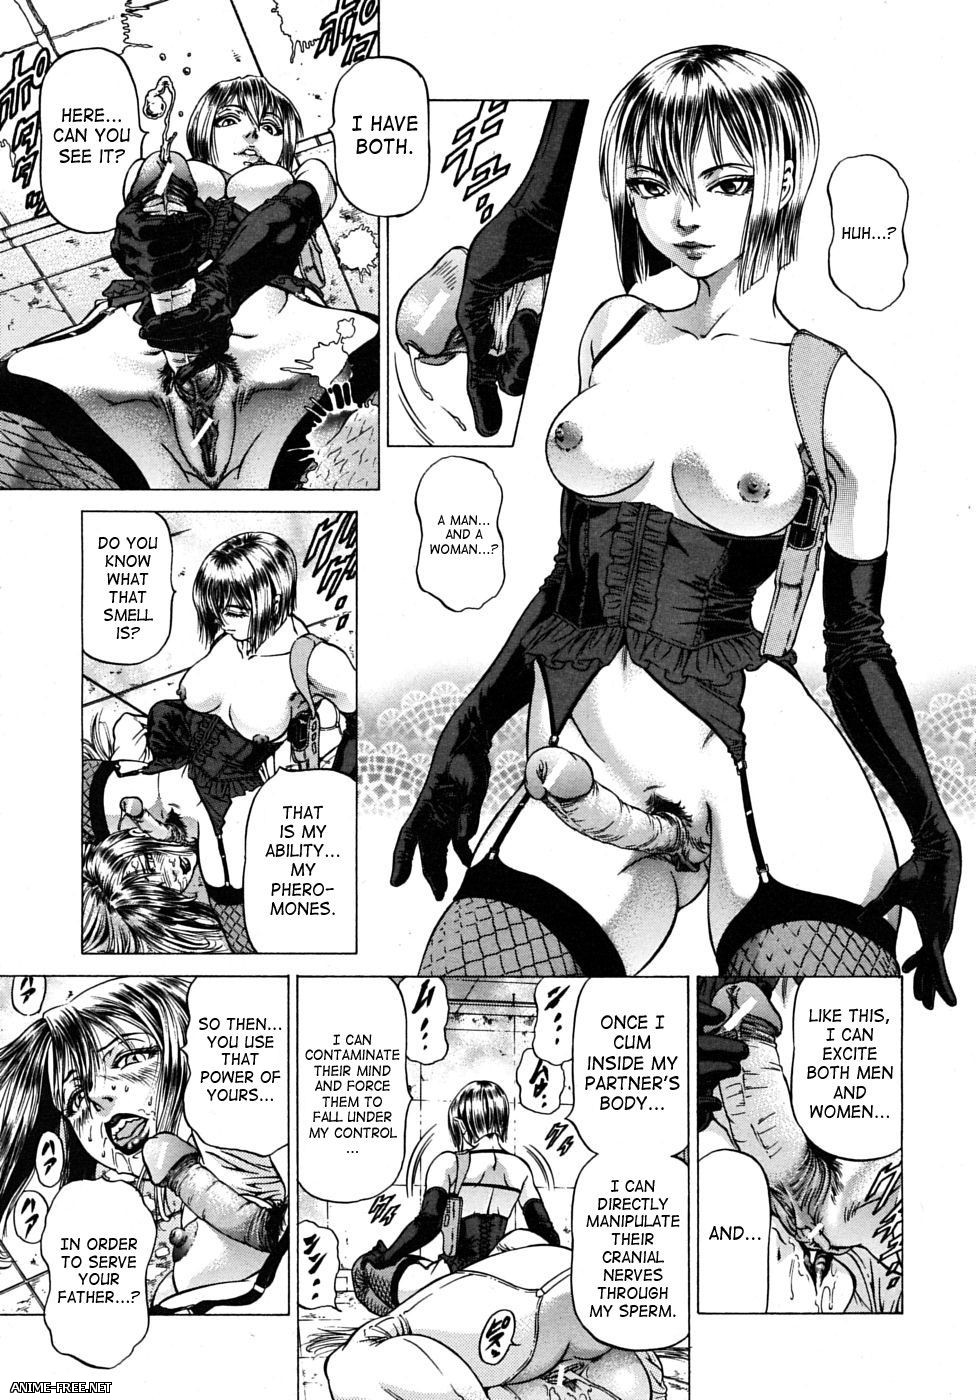 Kabuki Shigeyuki — Сборник хентай манги и иллюстраций [Cen] [JAP,ENG] Manga Hentai